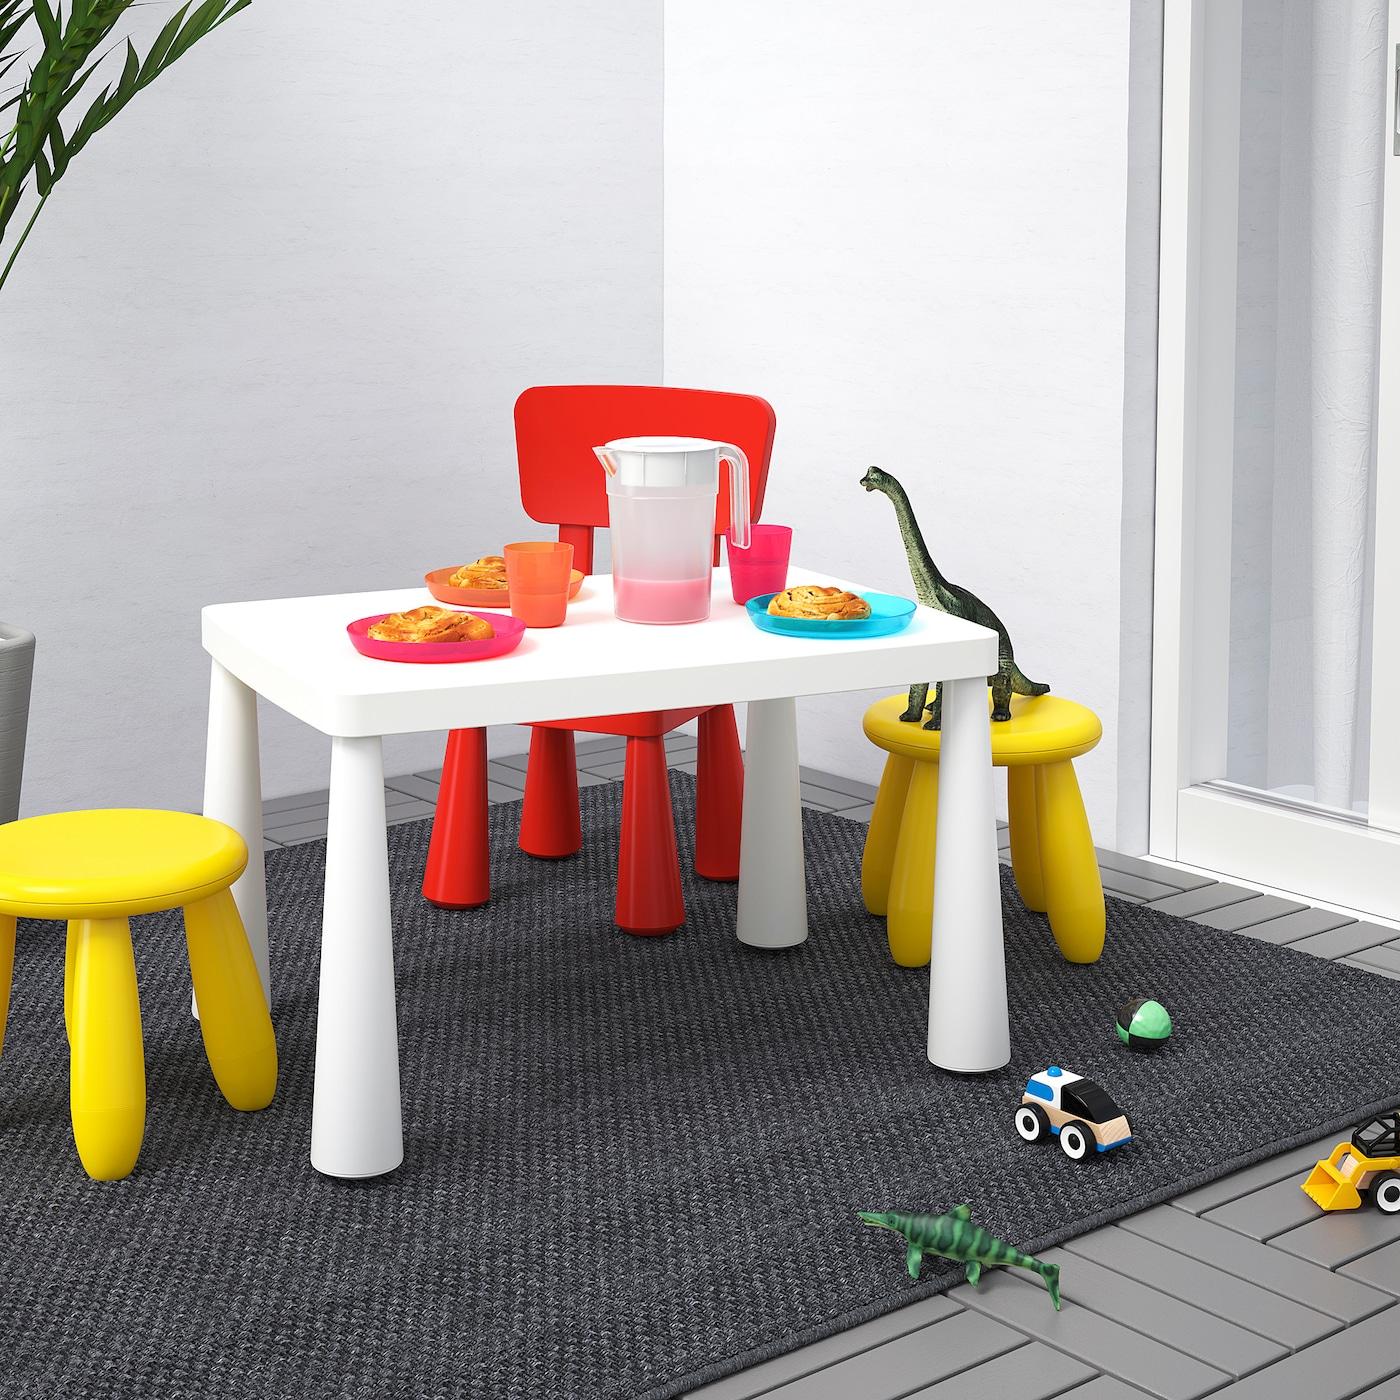 MAMMUT Children's table, in/outdoor white, 77x55 cm